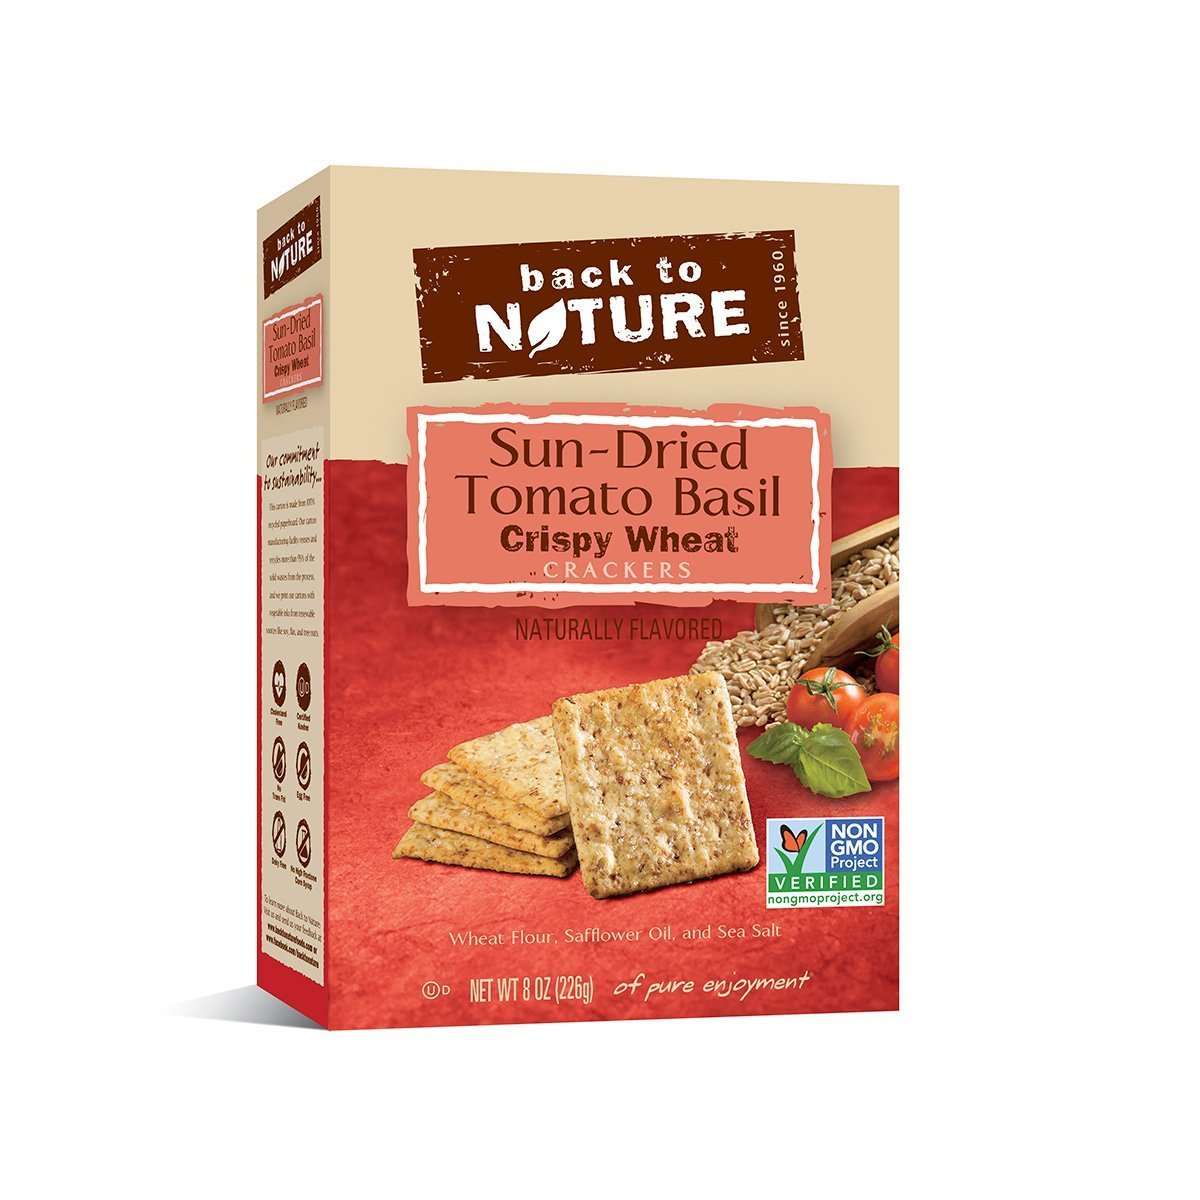 Back To Nature Crackers - Sundried Tomato Basil Crispy Wheat - 8 oz